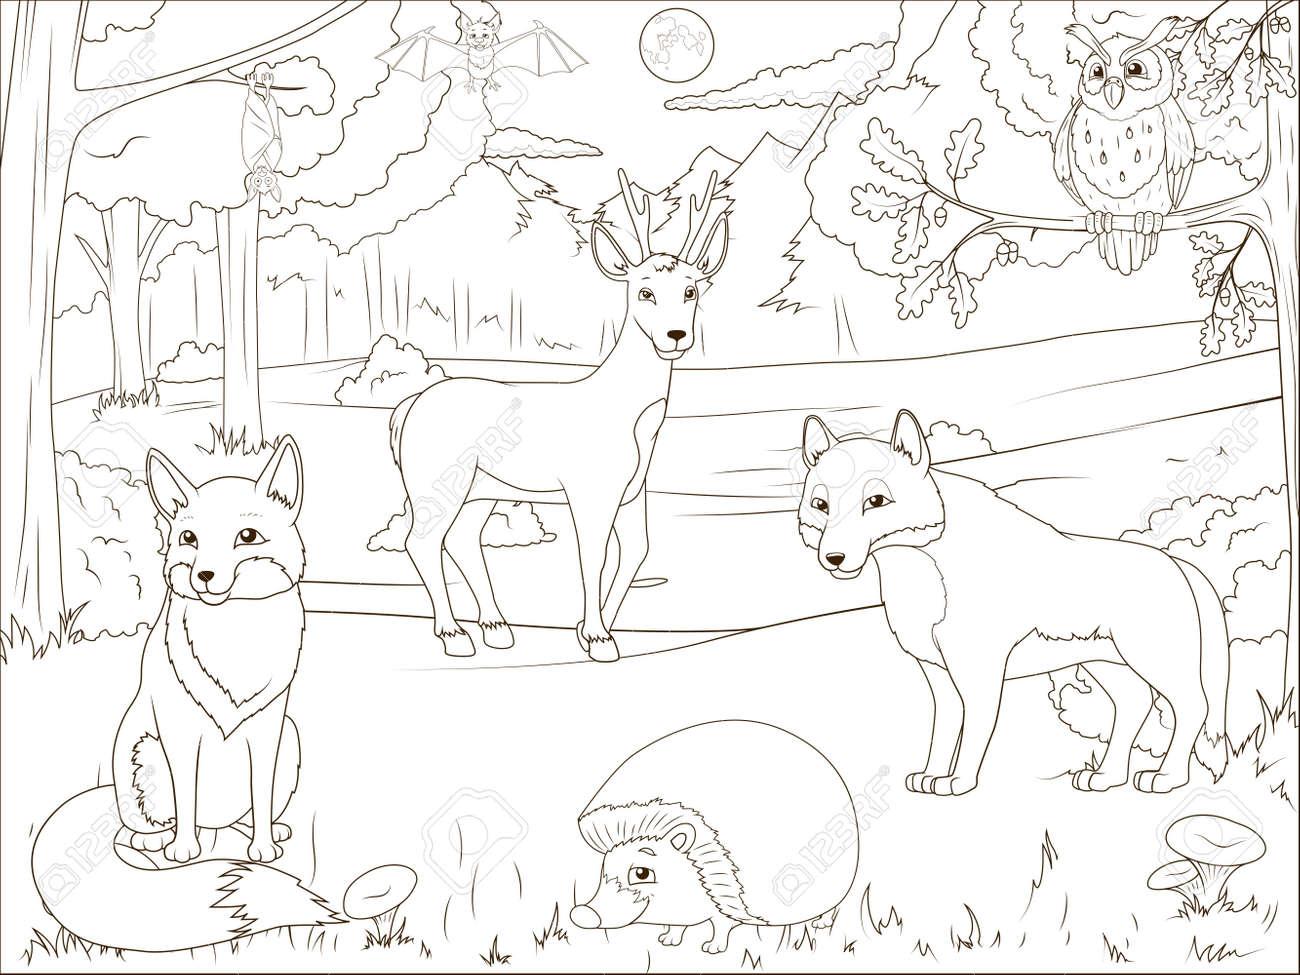 Lujo Dibujos Para Colorear Paisajes Con Animales